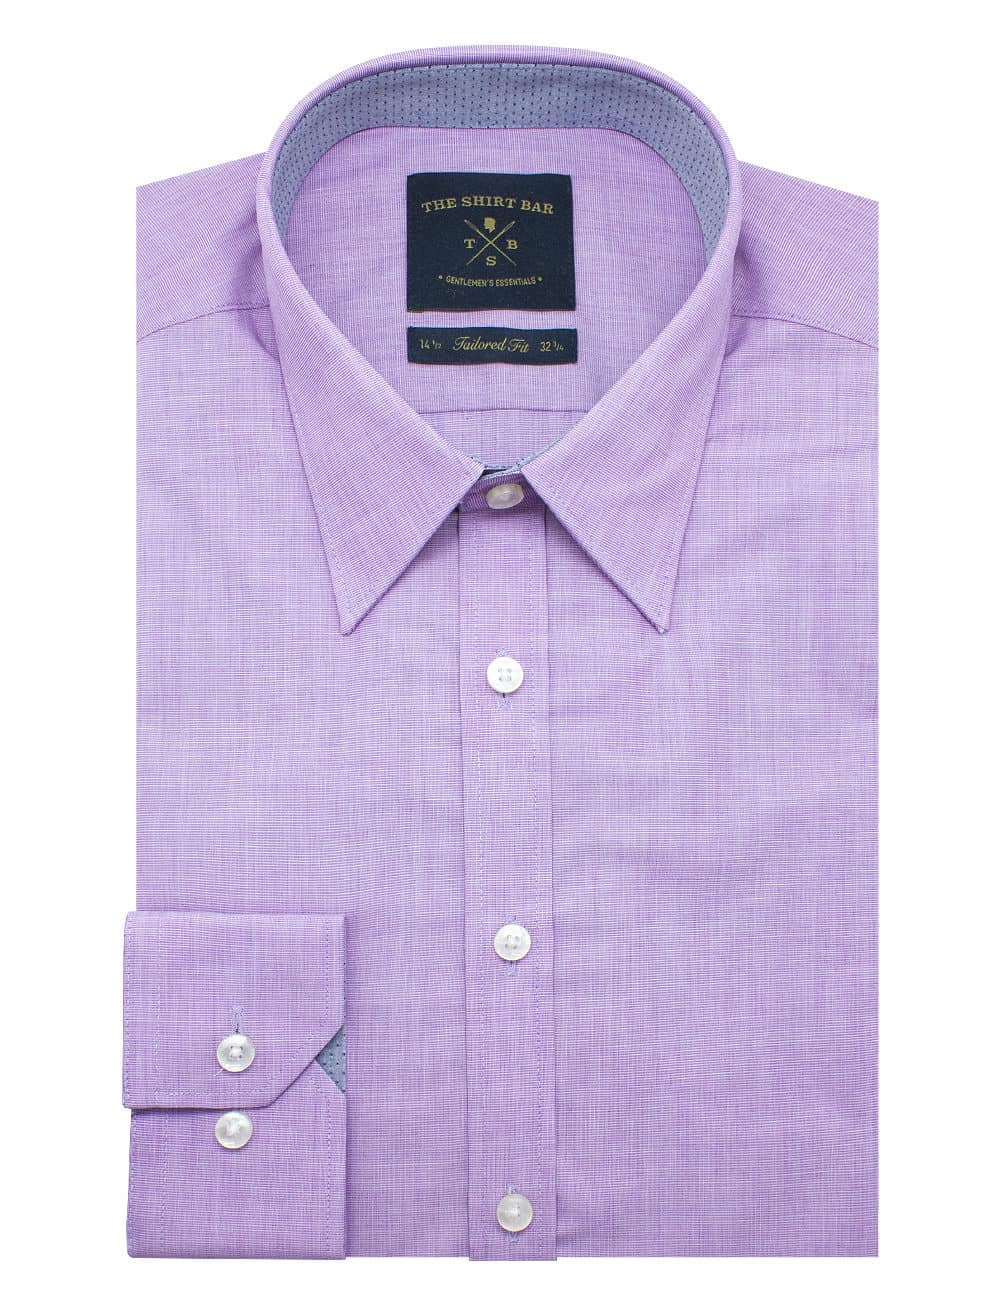 Tailored Fit Cotton Blend Lilac Fil A Fil Spill Resist Long Sleeve Single Cuff Shirt TF33A5.10